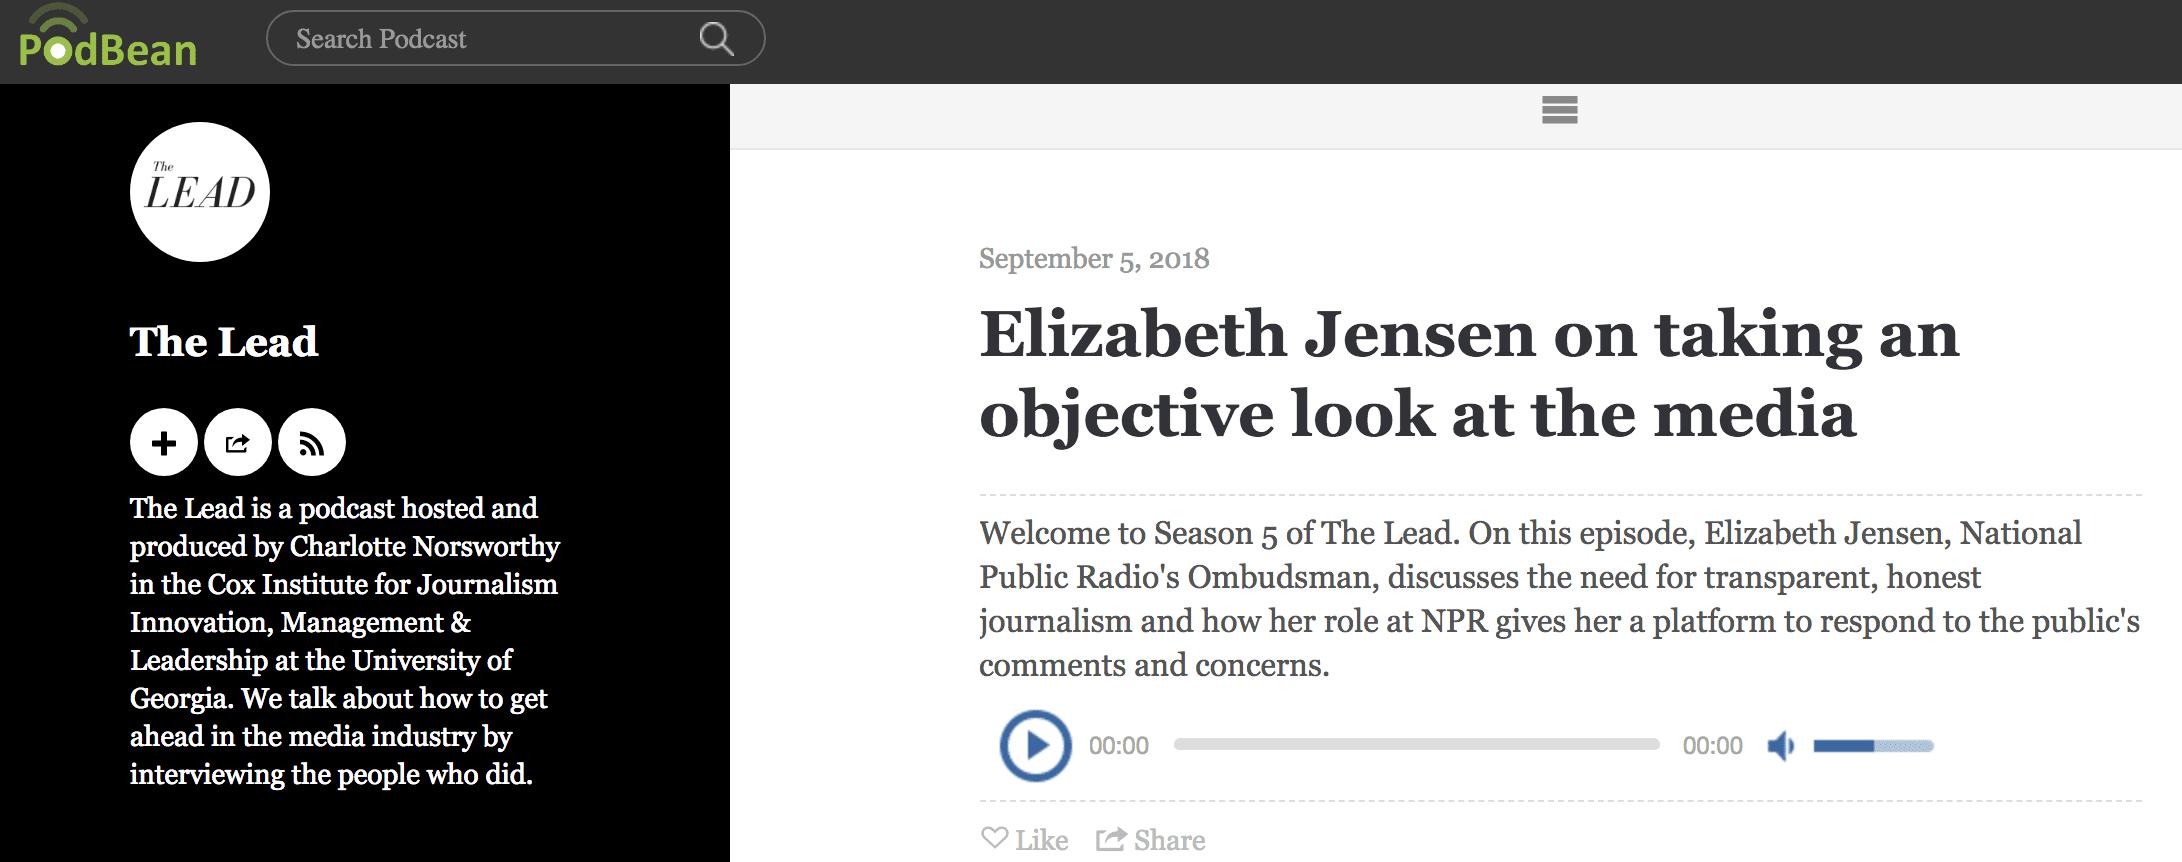 The Lead: Elizabeth Jensen on Taking an Objective Look at the Media